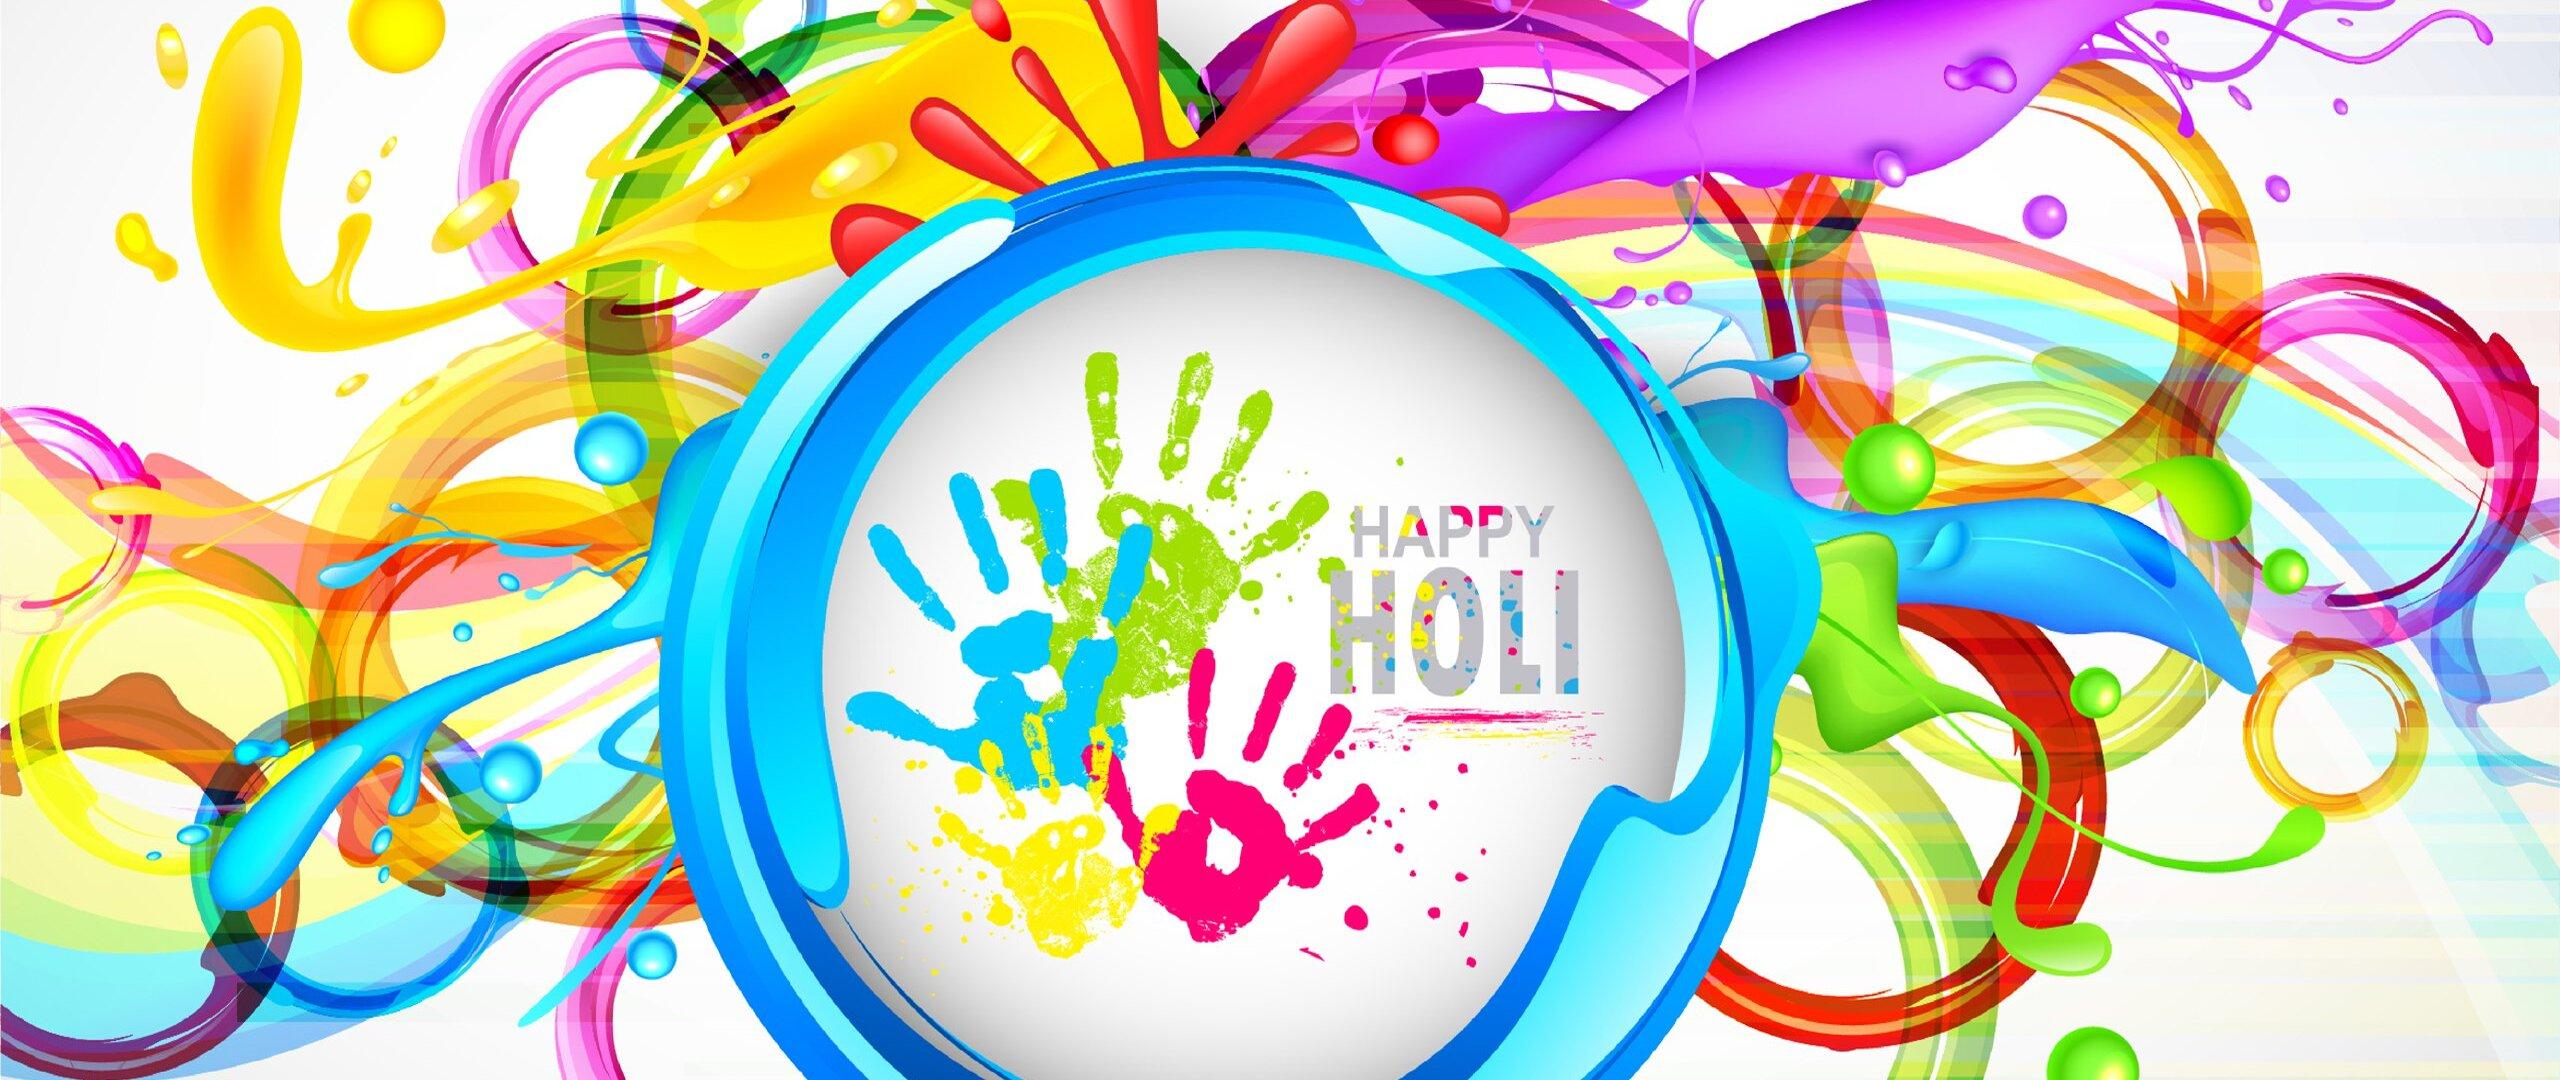 happy-holi-images.jpg